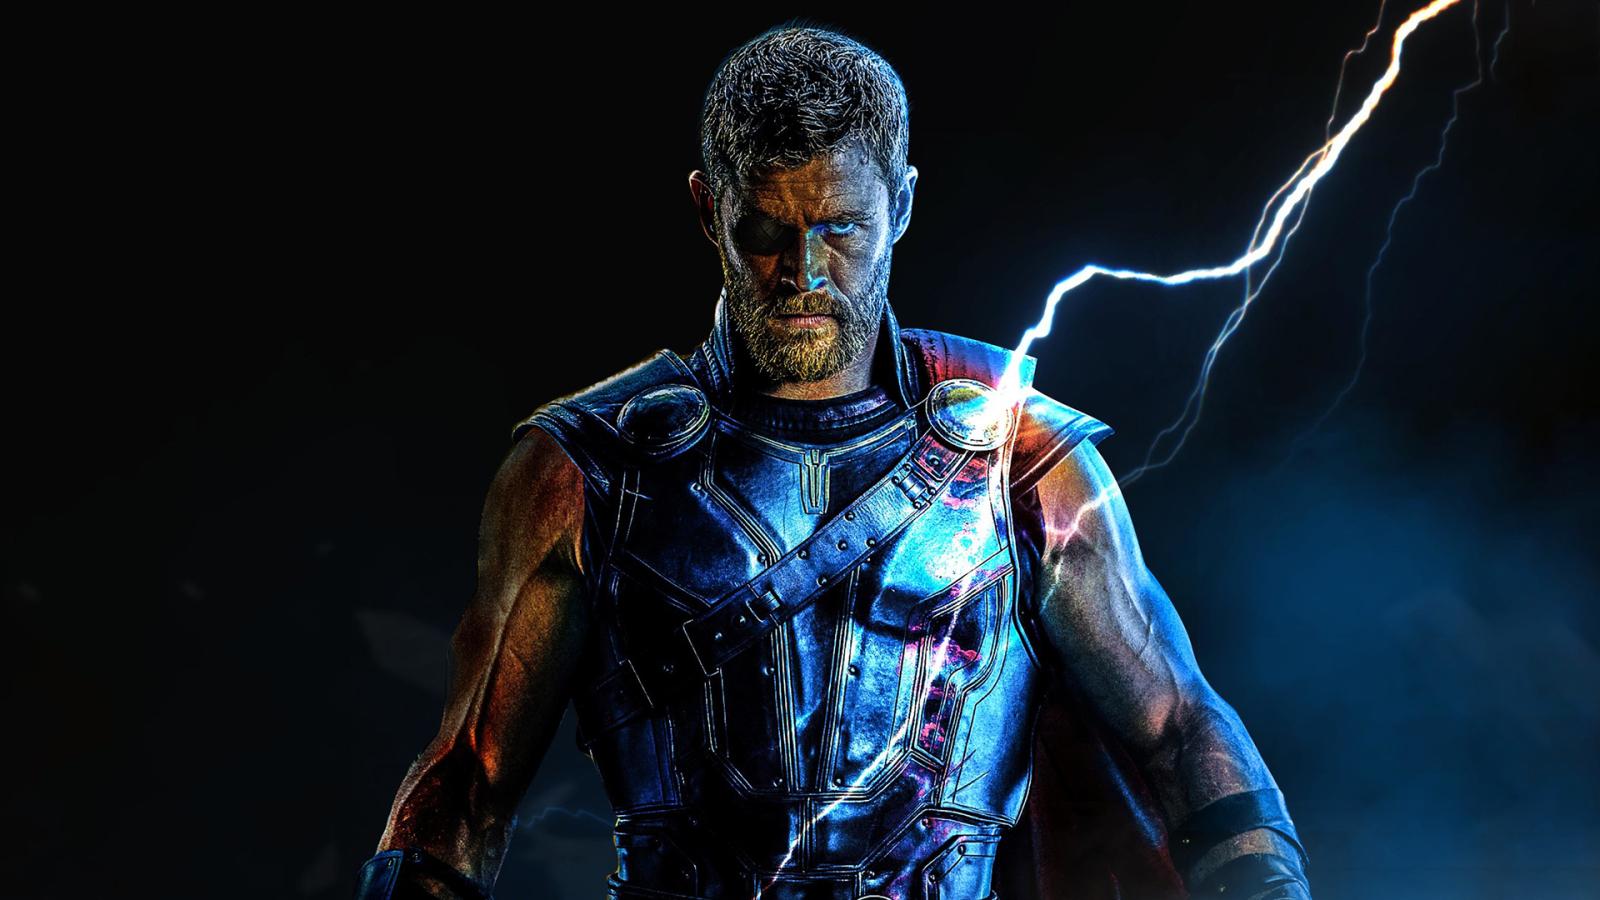 Download Infinity War Thor Digital Art 840x1336 Resolution